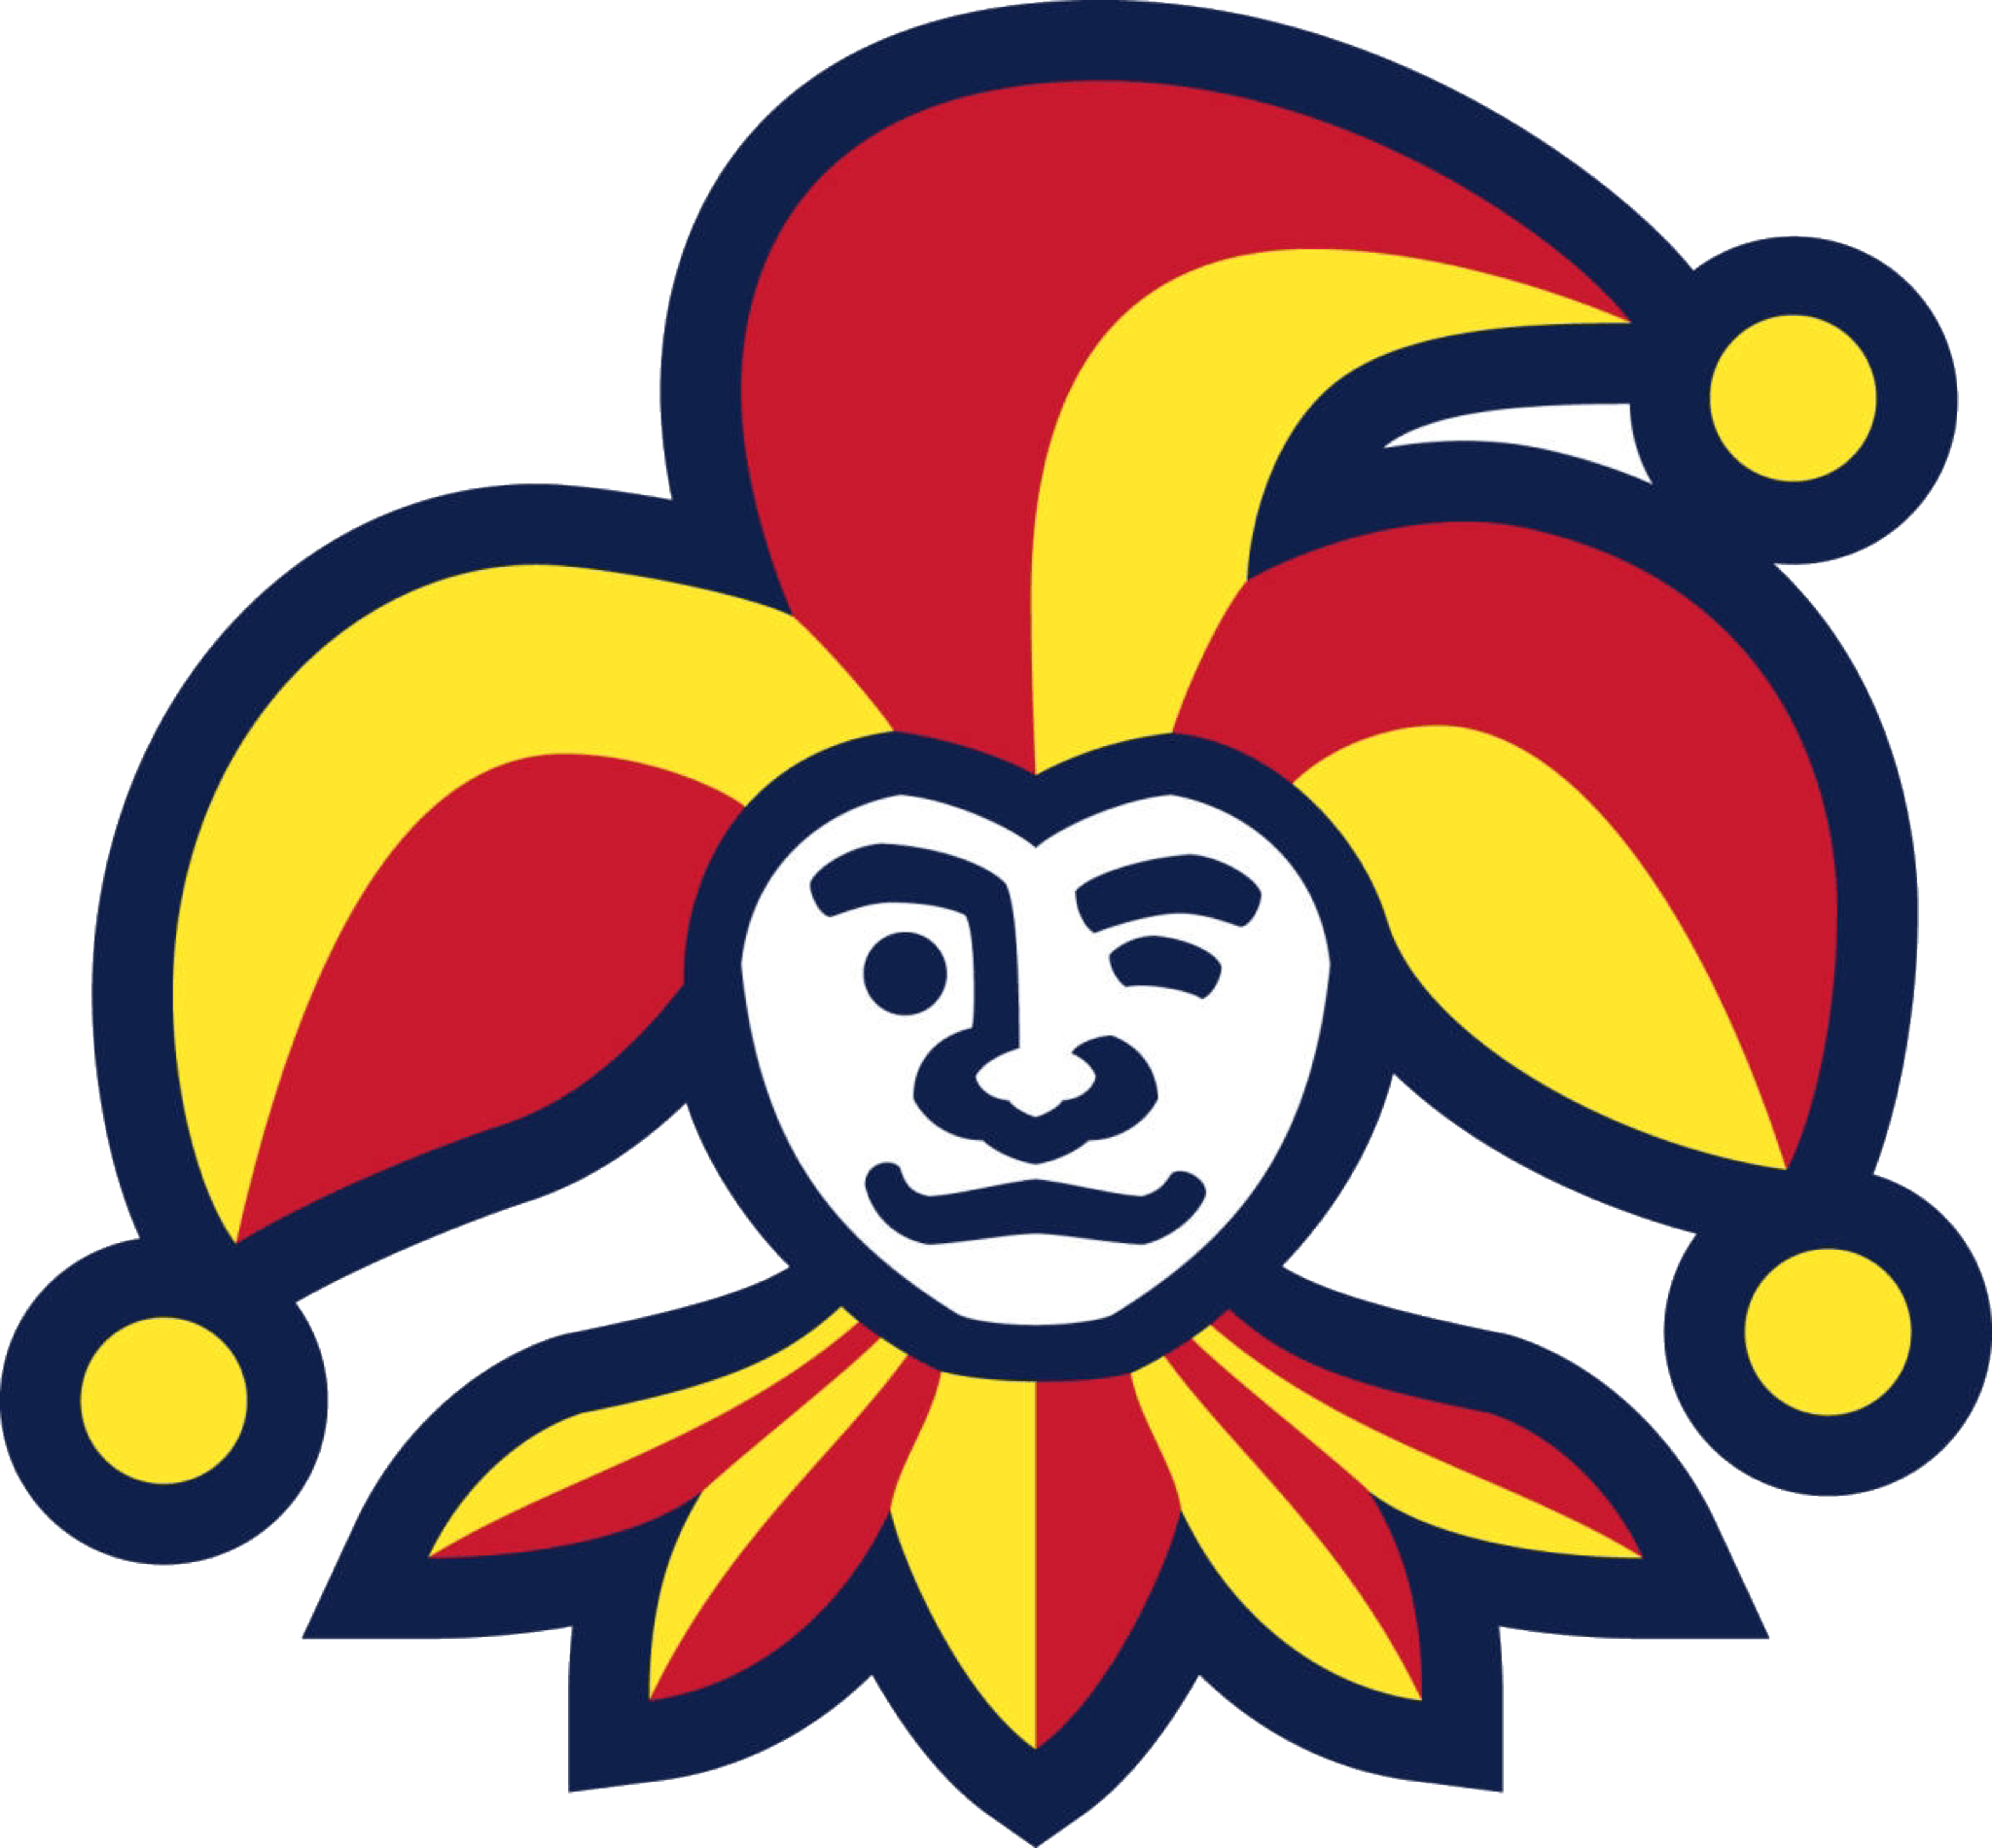 Helsingin Jokerit Ry logo